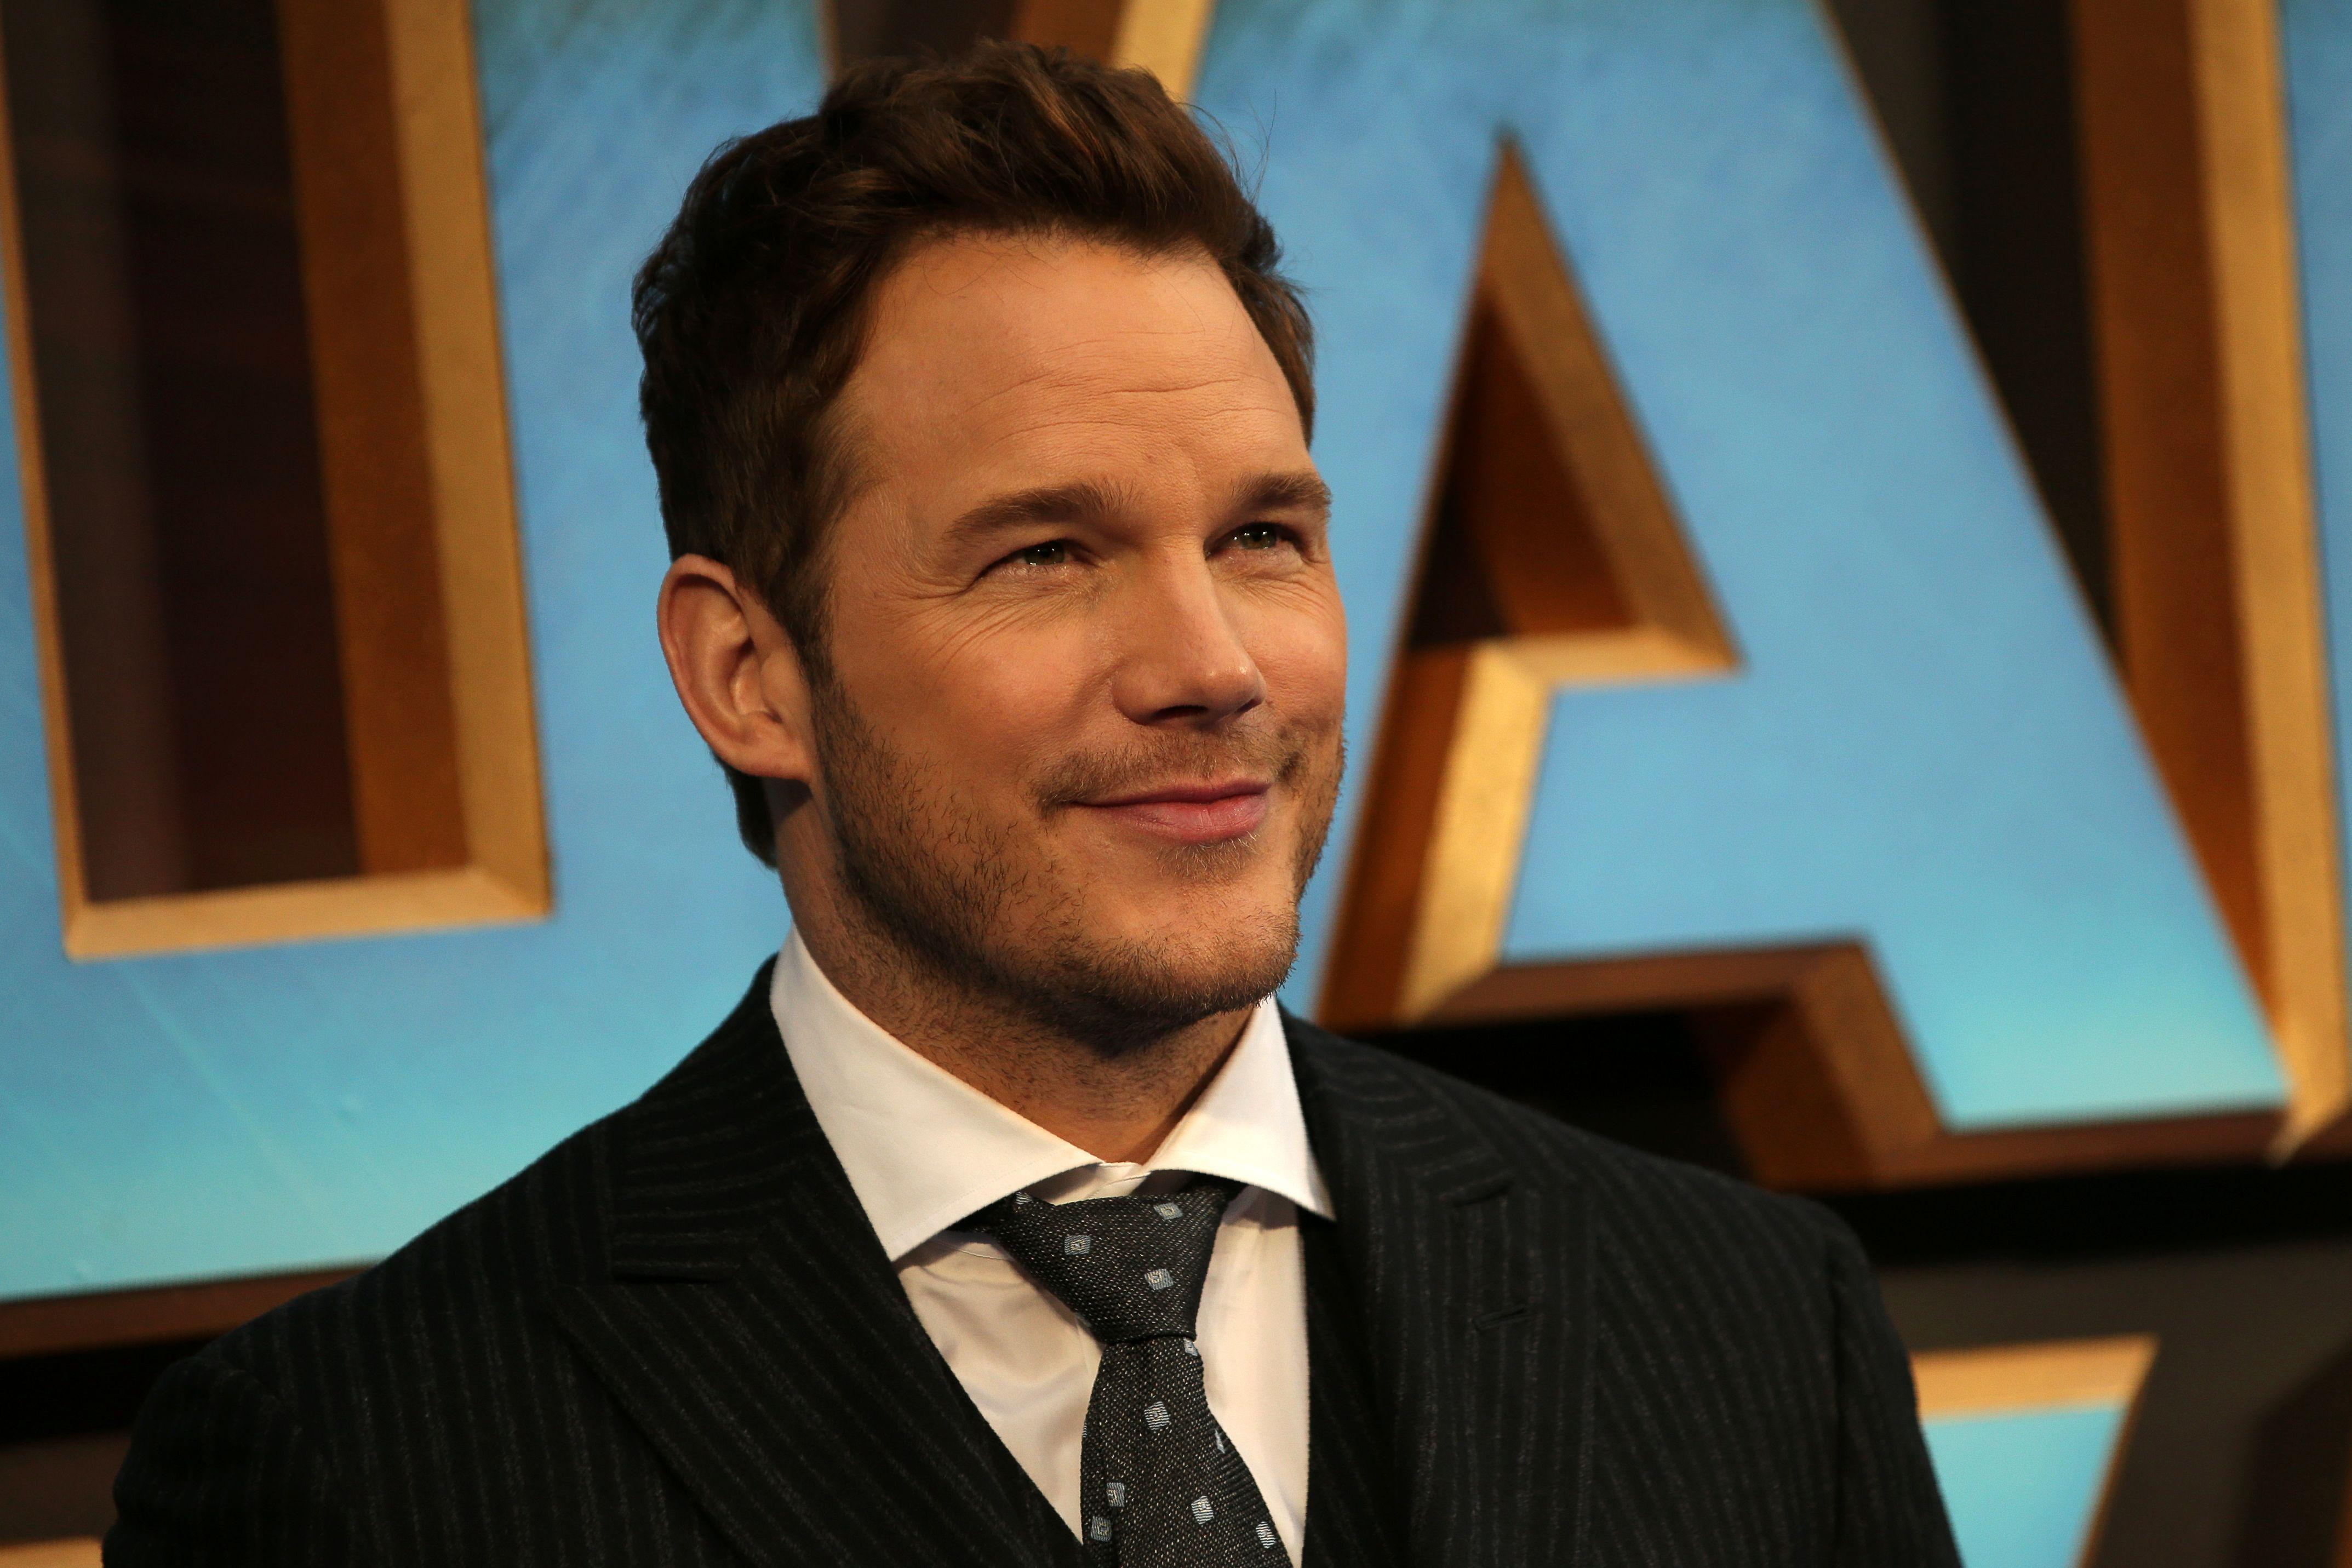 Chris Pratt 'Guardians of the Galaxy' Premiere